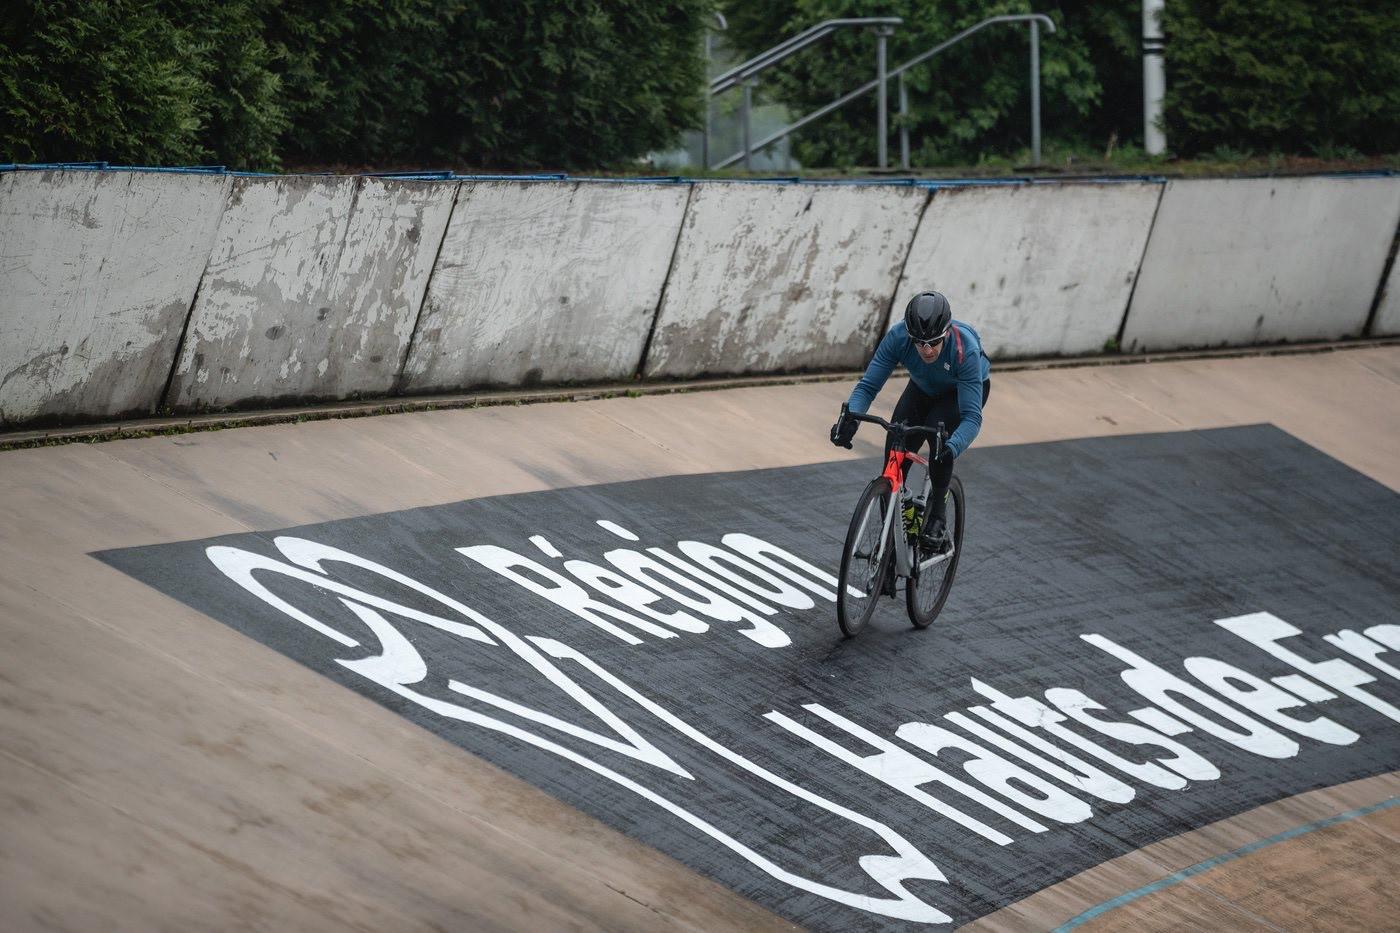 Specialized Roubaix 2020 en el velódromo de Roubaix